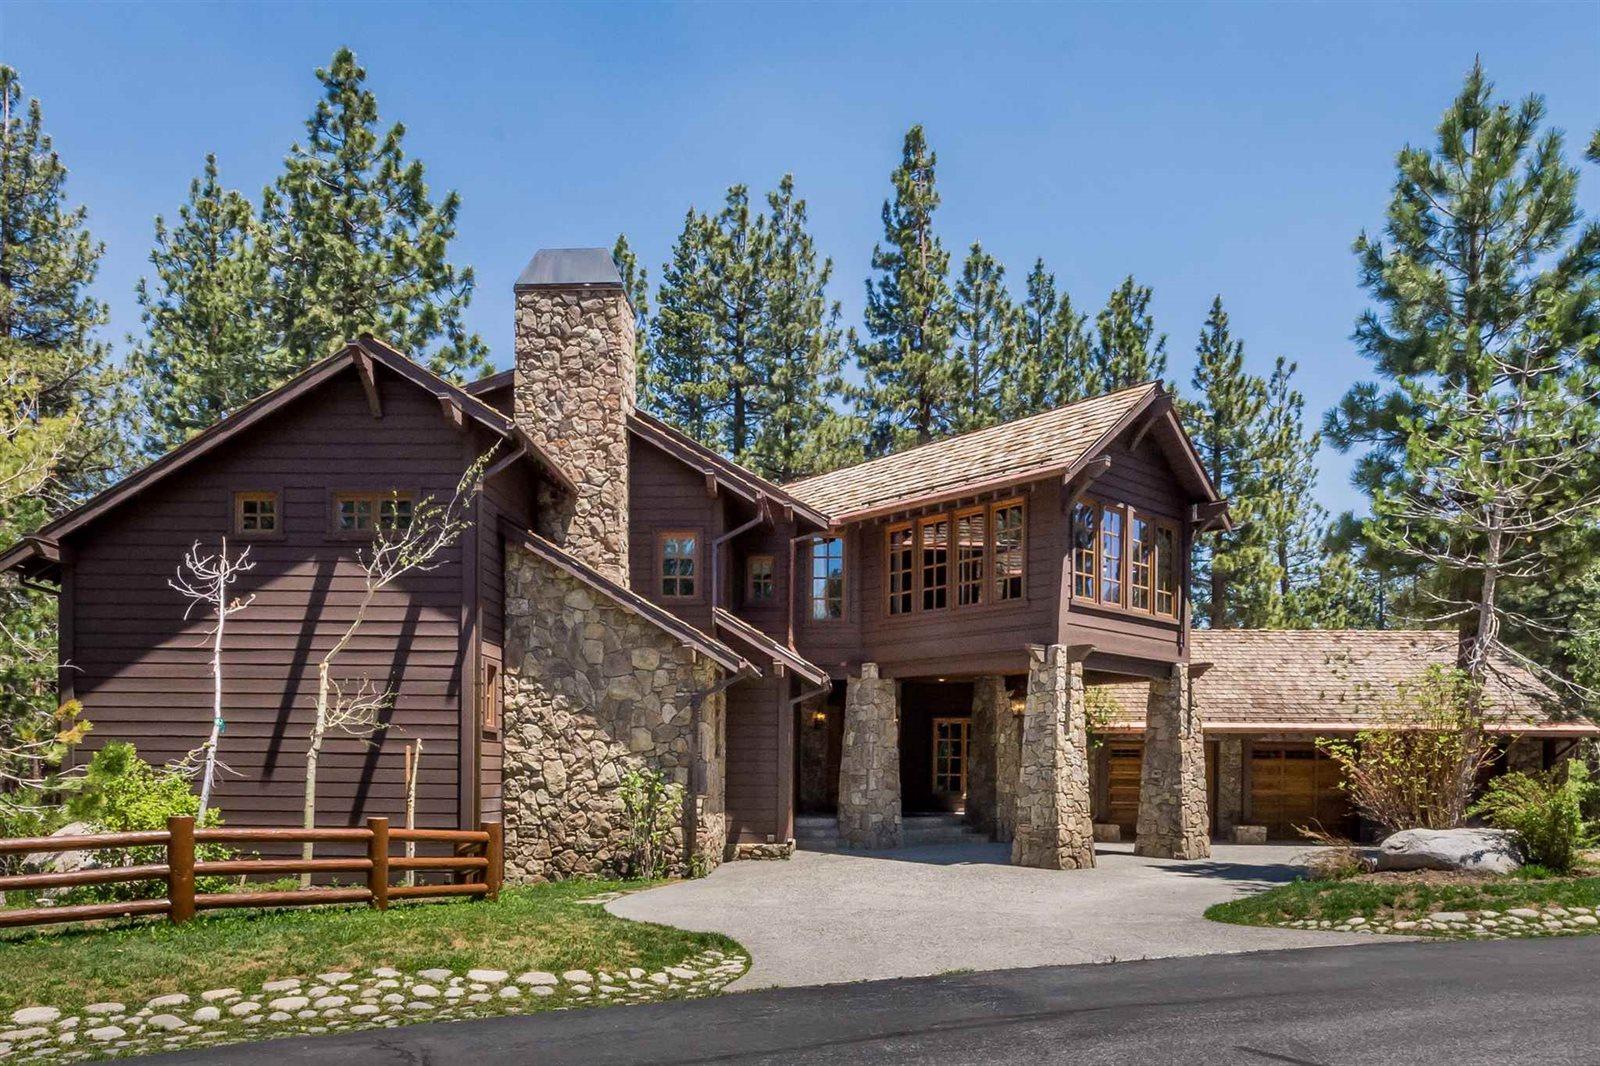 201 Starwood Dr, Mammoth Lakes, CA 93546